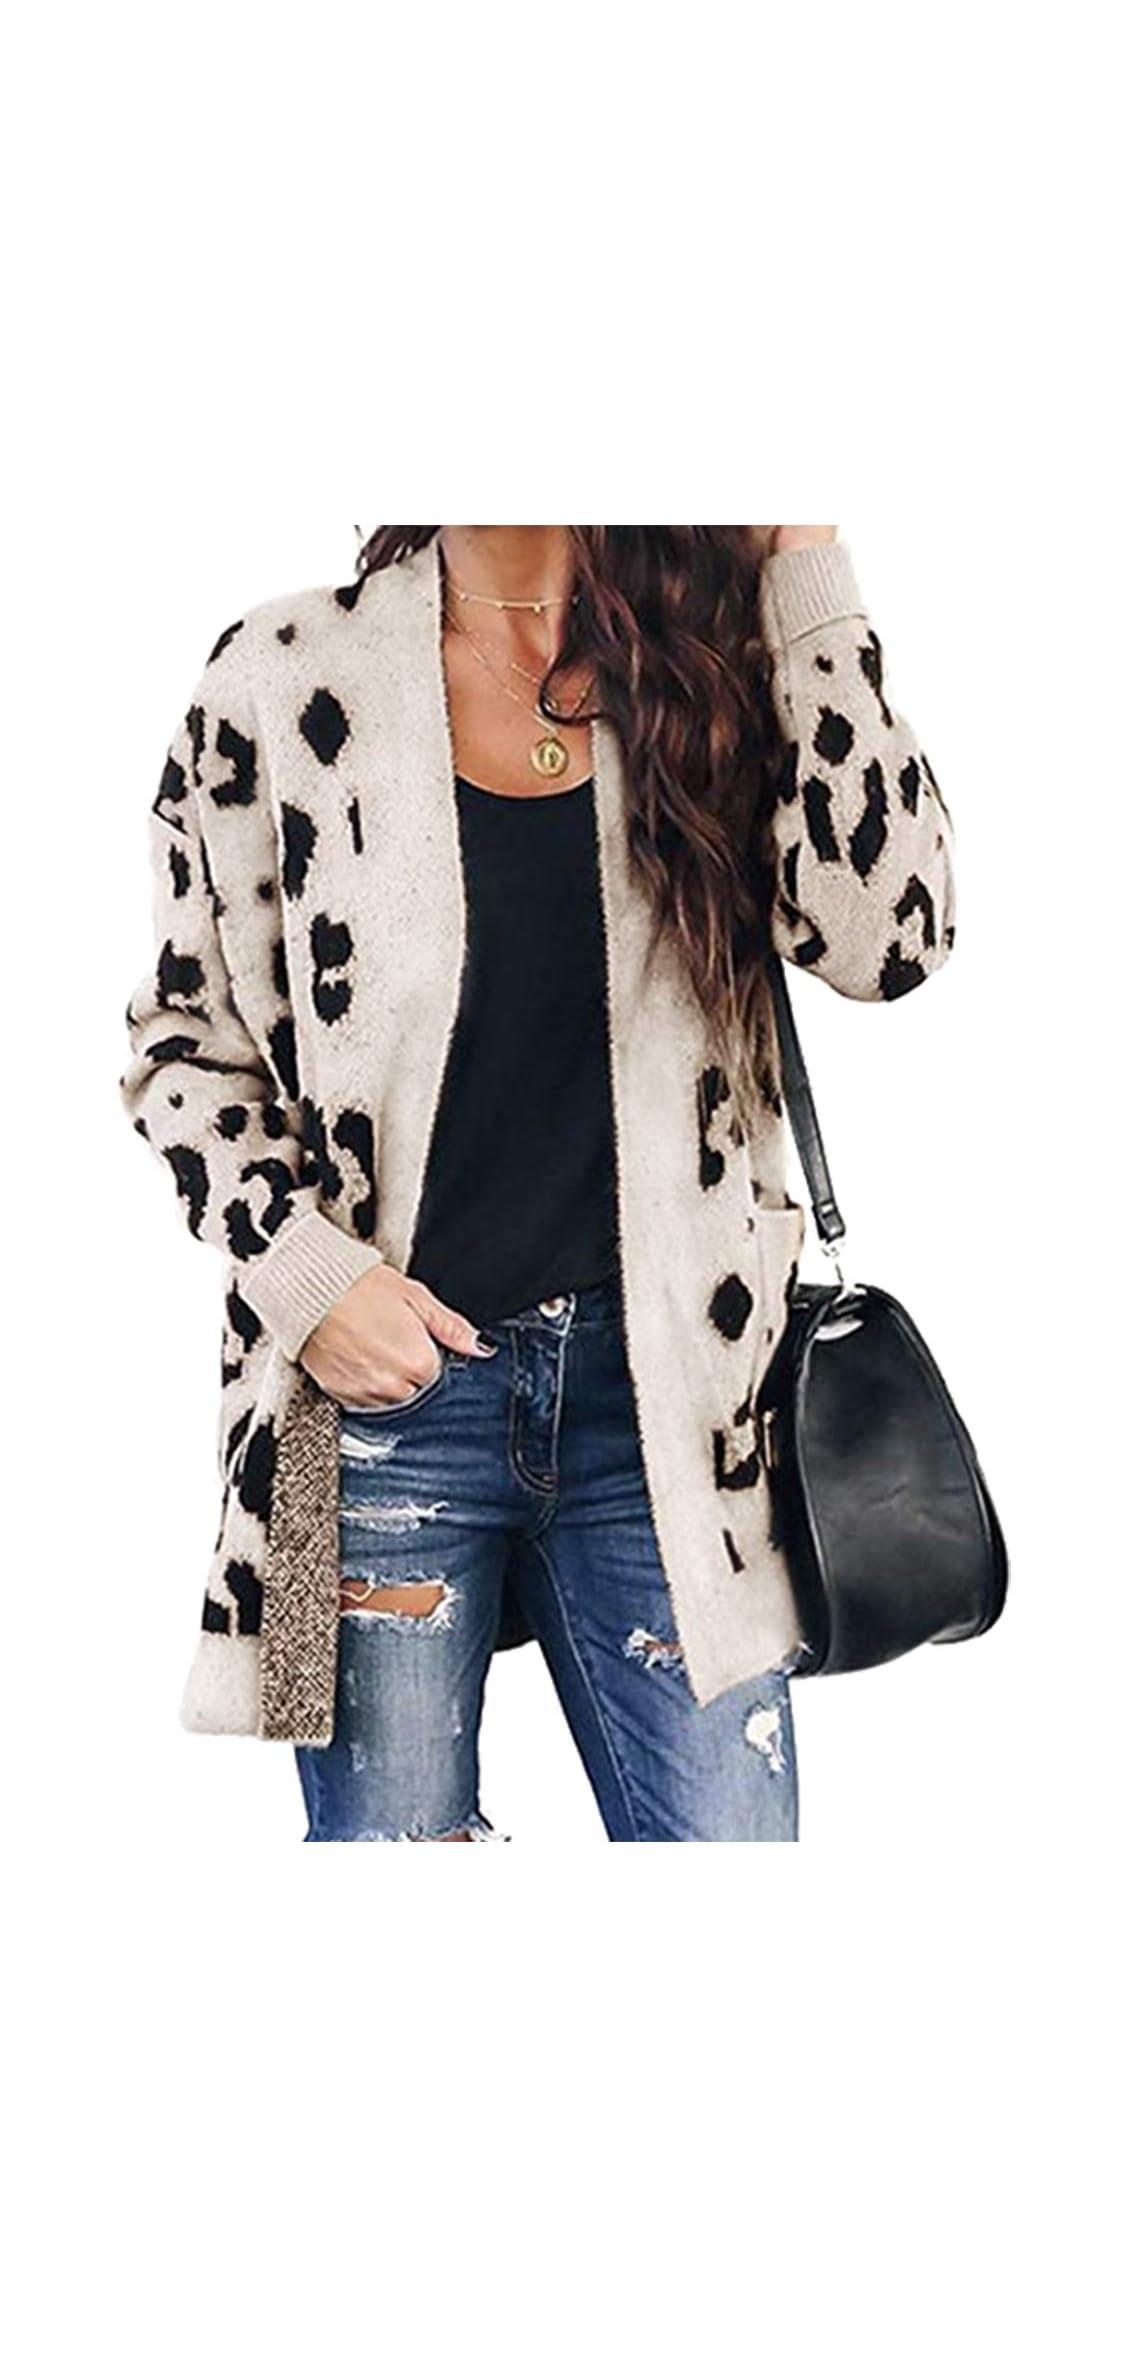 Women Chic Leopard Print Cozy Sweater Pockets Button Down